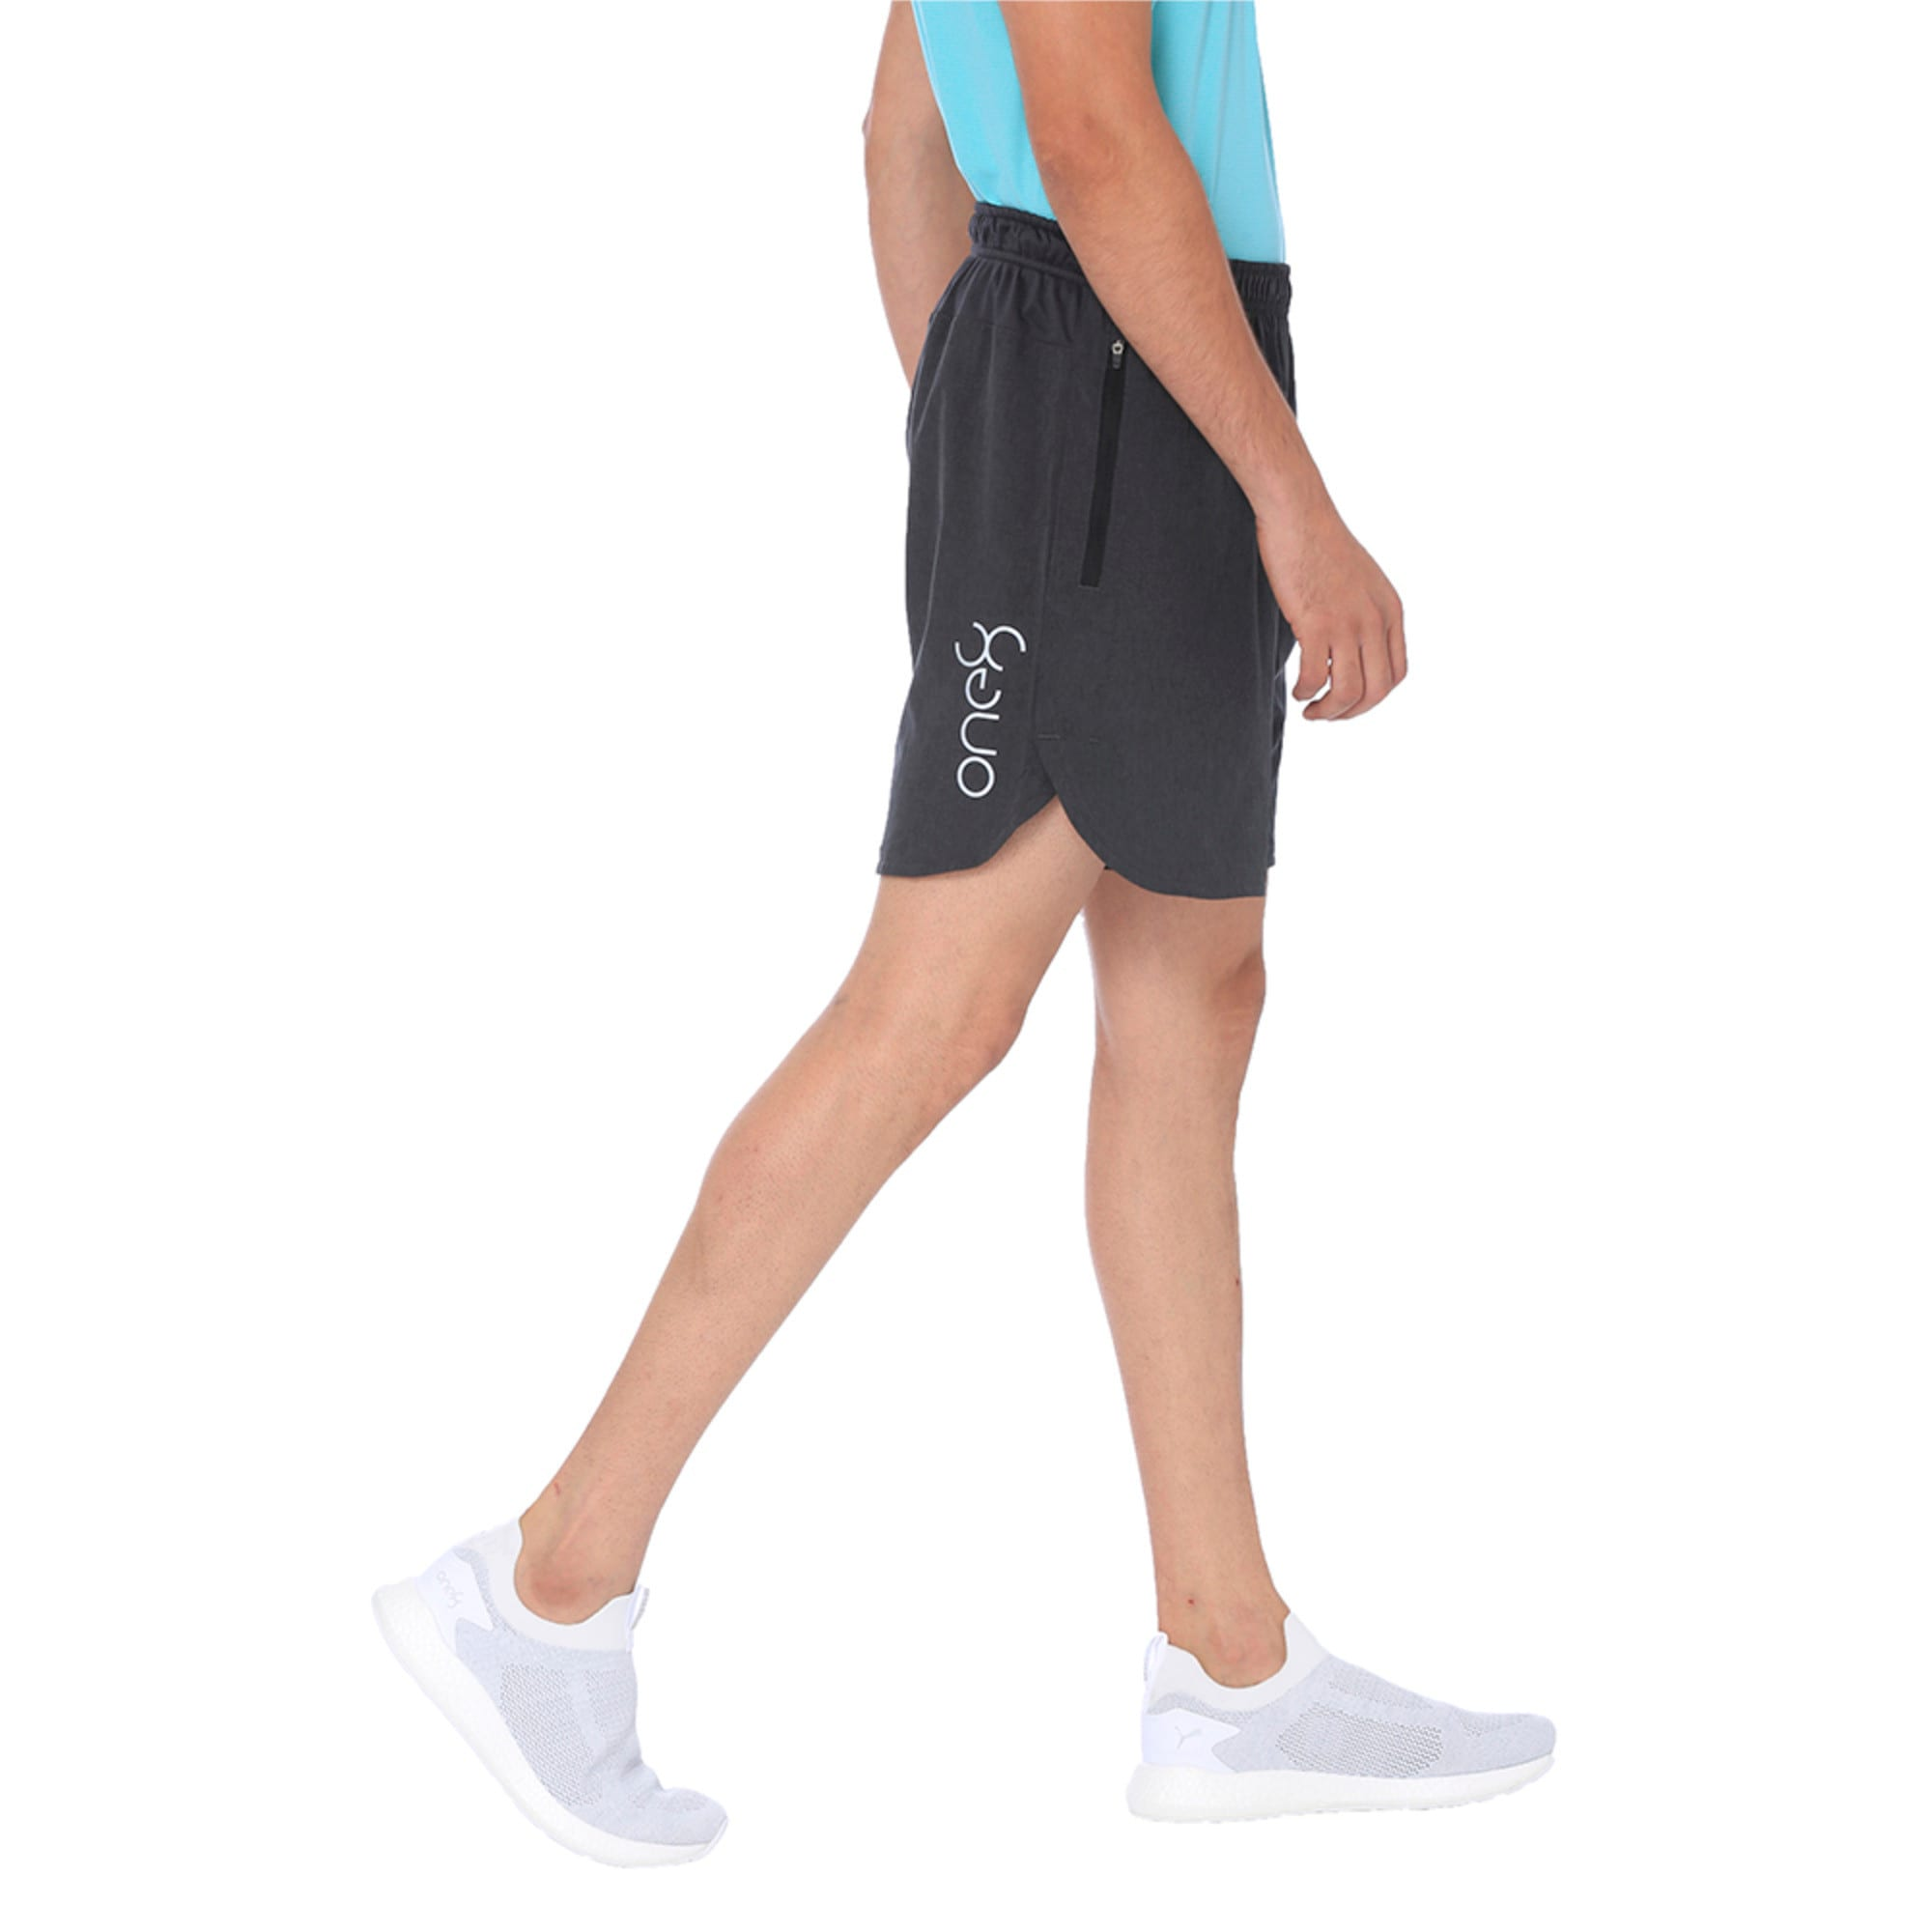 Thumbnail 2 of one8 VK Men's Active Shorts, Dark Gray Heather, medium-IND